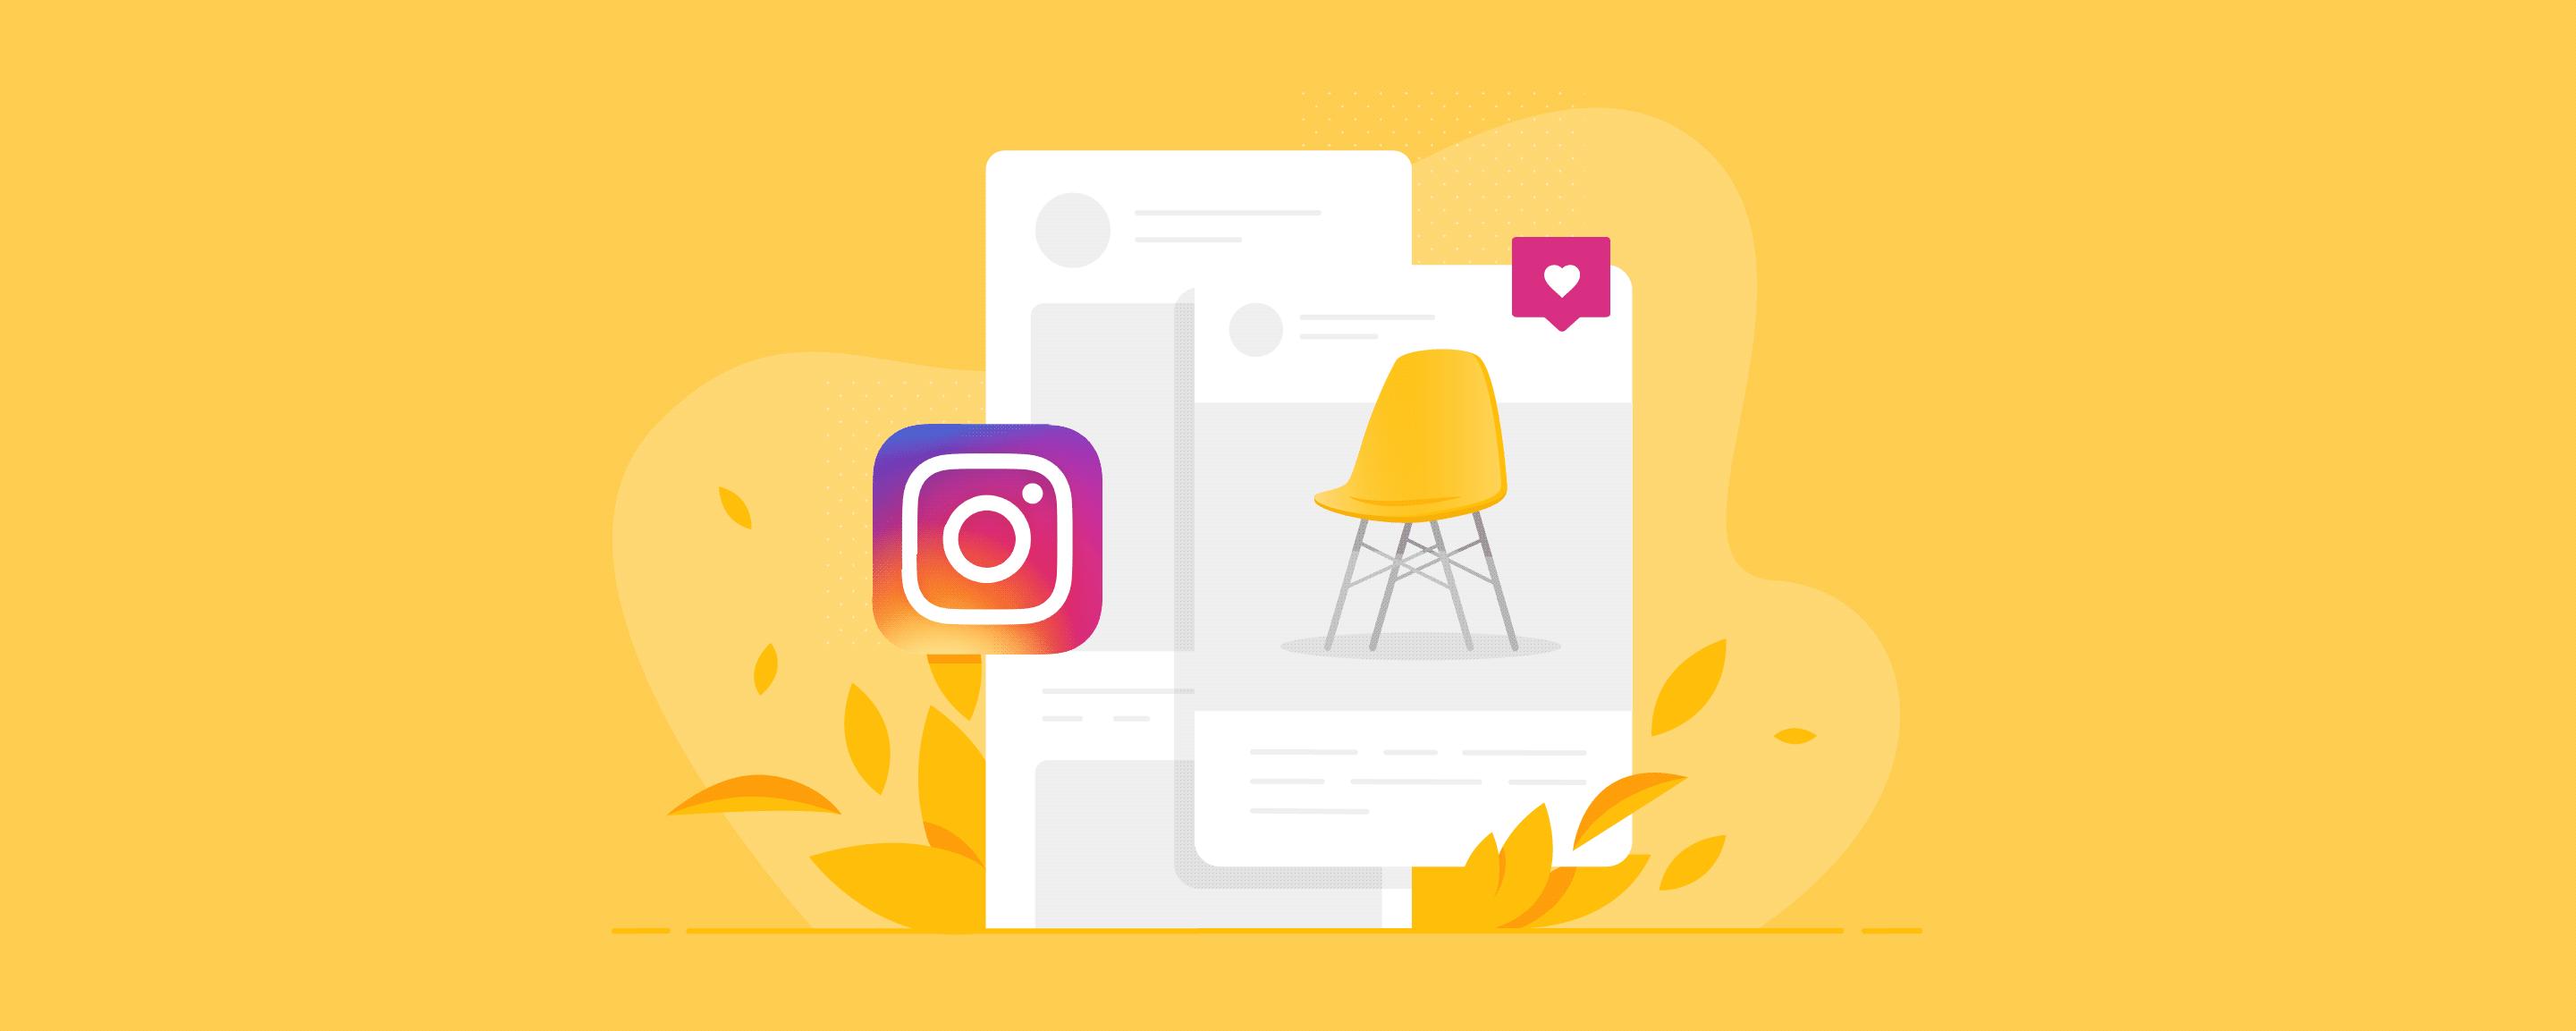 Striking Marketing Ideas on Instagram